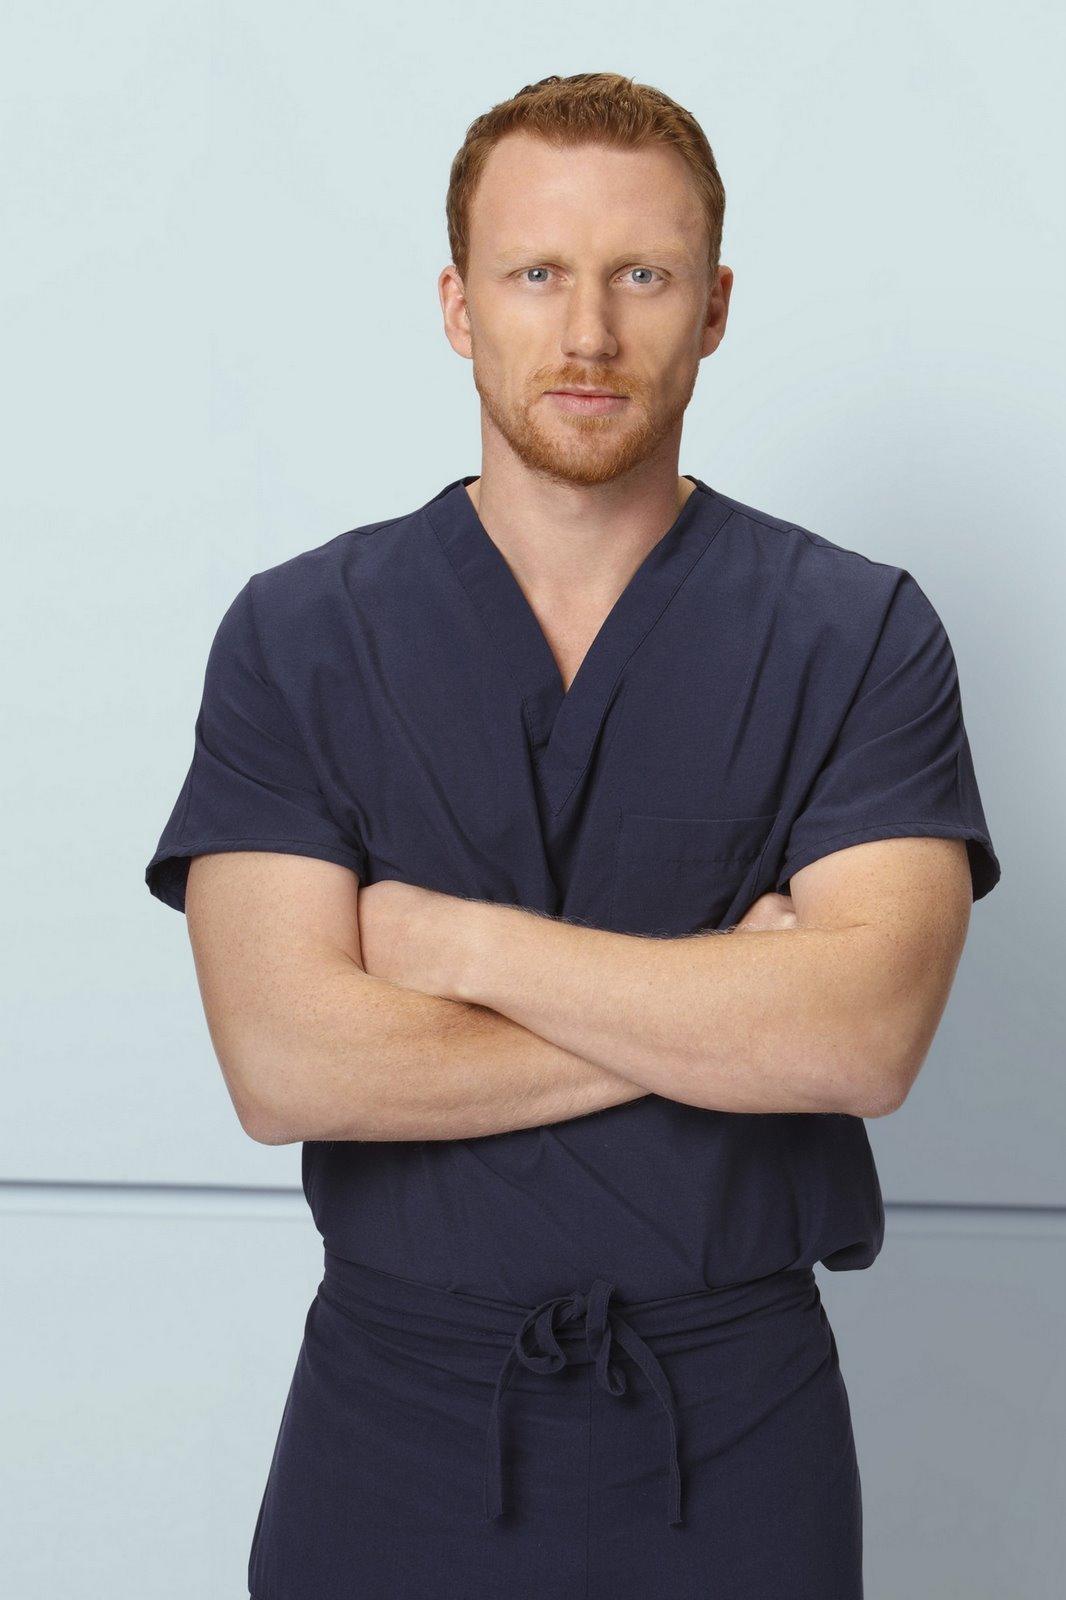 Owen GreyS Anatomy